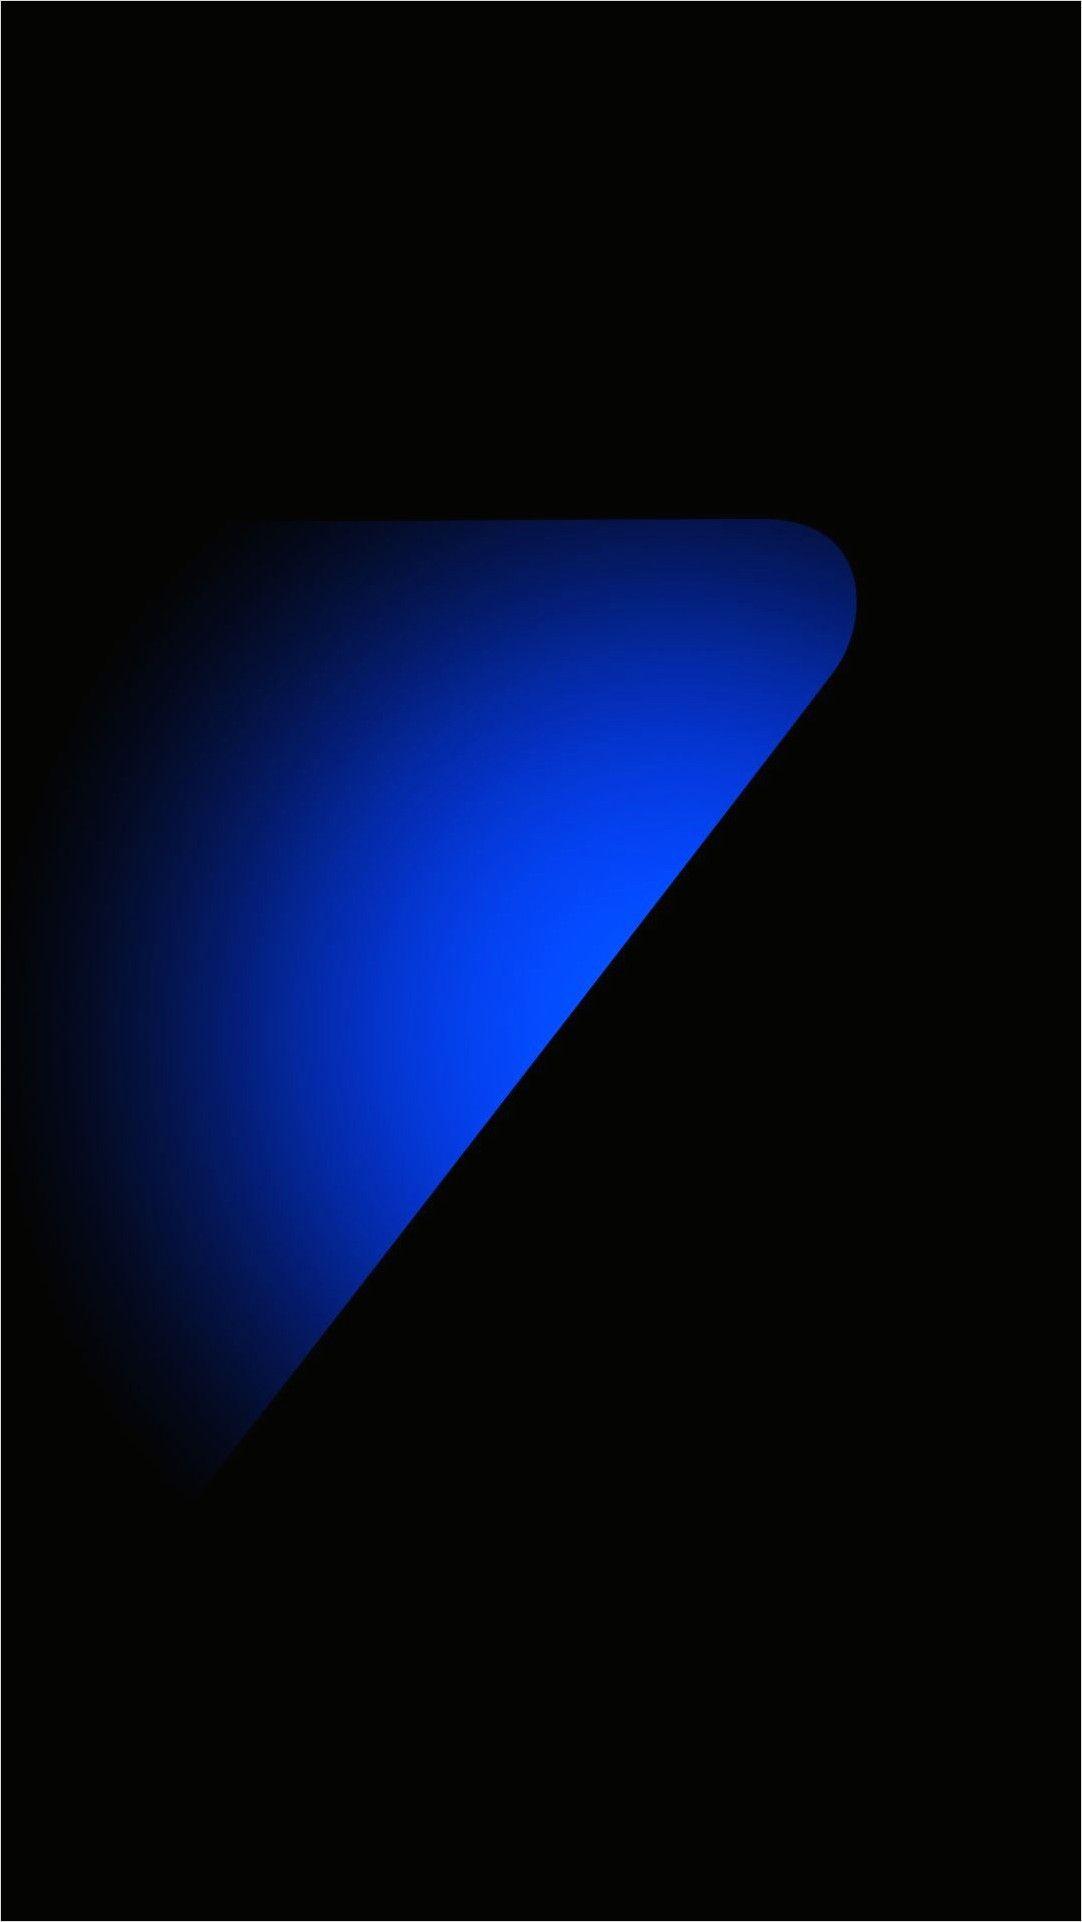 Wallpaper S7 Edge 4k In 2020 Samsung Wallpaper Samsung Galaxy Wallpaper Phone Wallpaper Design